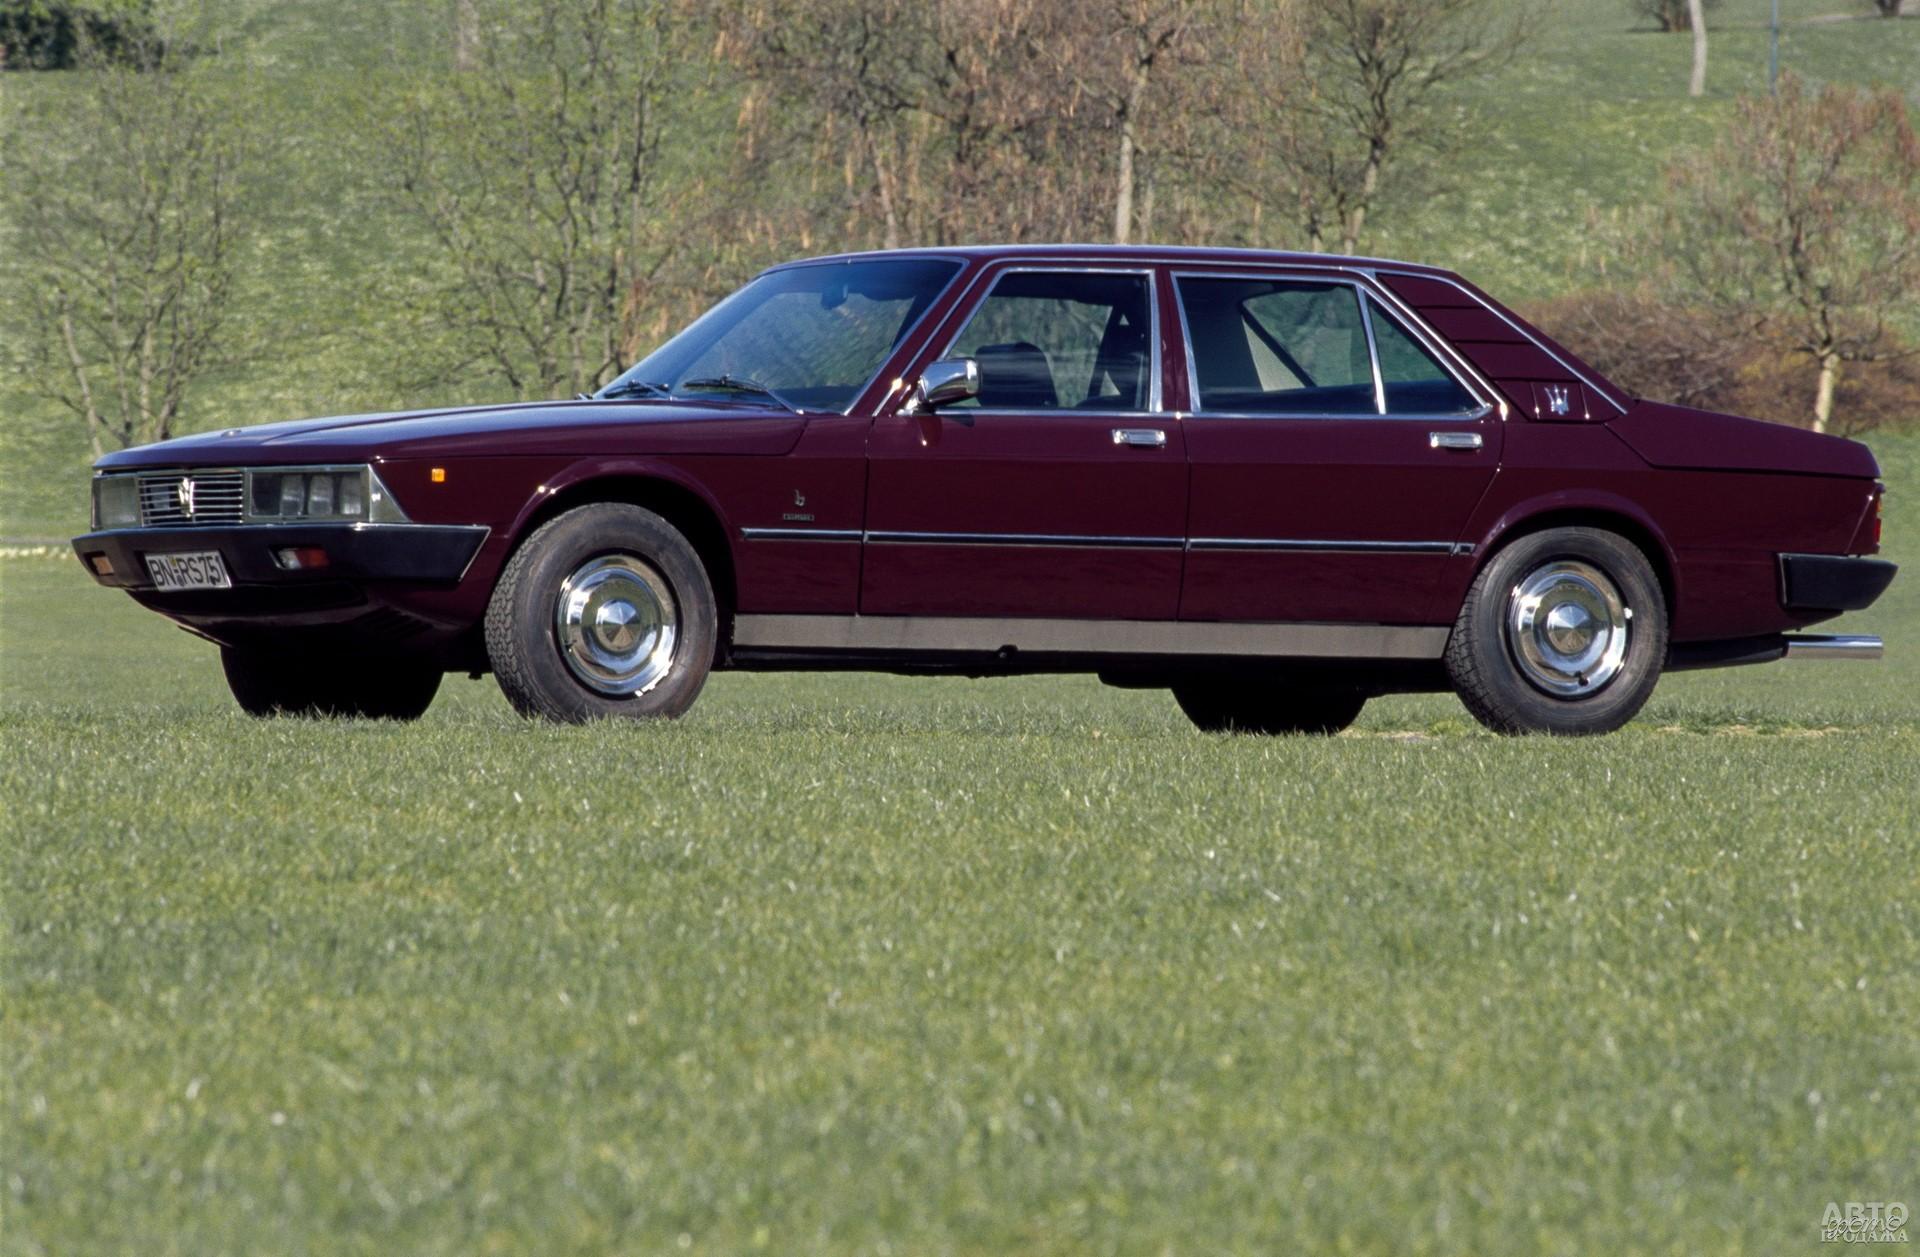 Переднеприводный Mаserati Quattroporte ІІ 1974 года